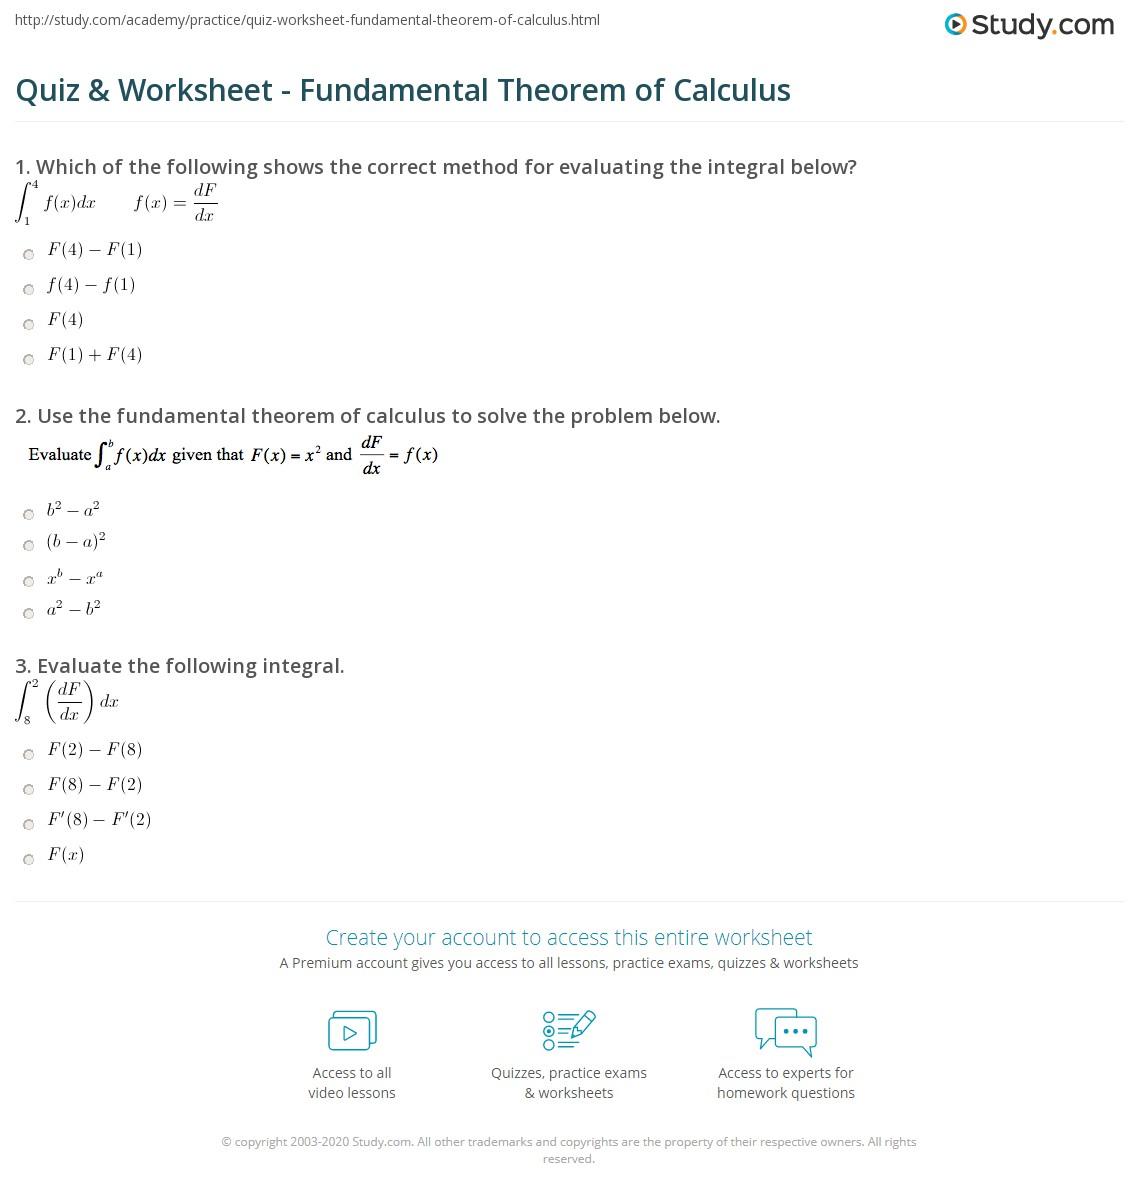 Worksheets Calculus Worksheet quiz worksheet fundamental theorem of calculus study com print the worksheet